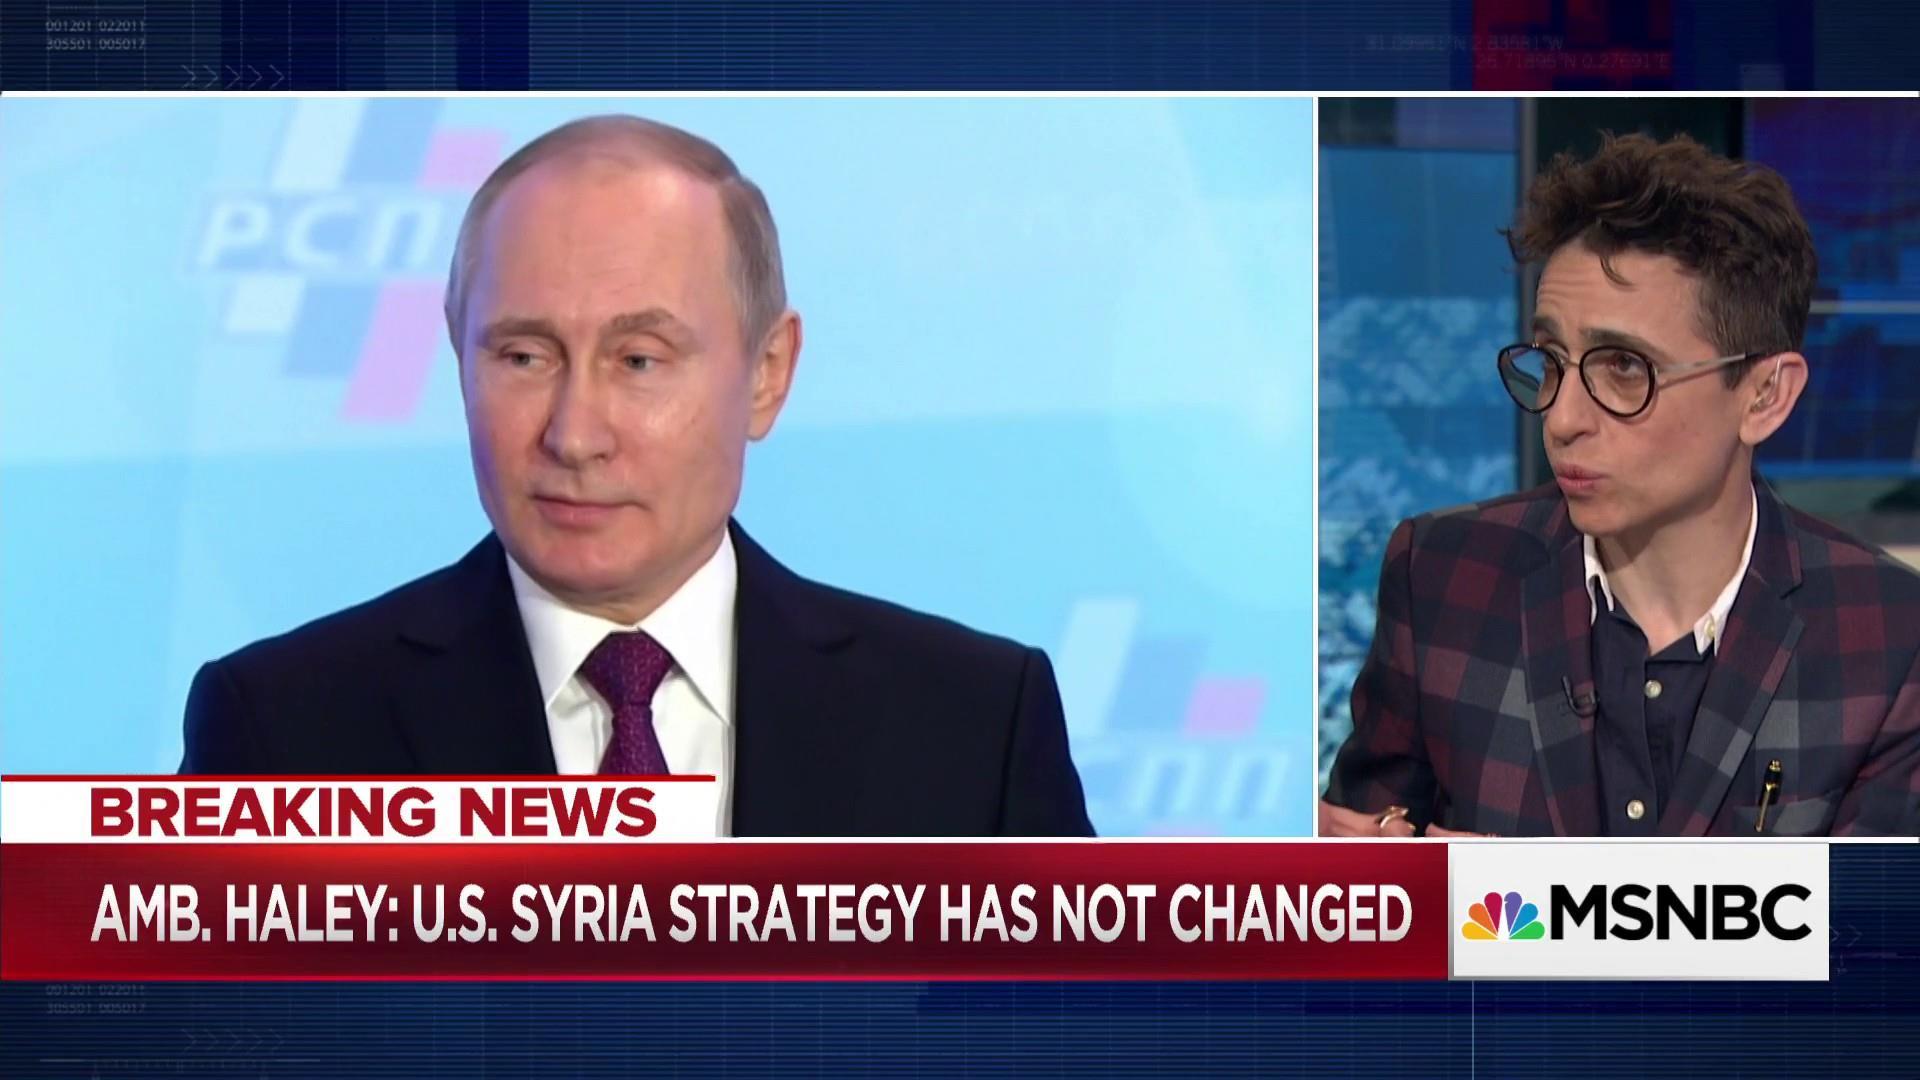 Gessen: Putin wants a rhetorical war without too many coffins